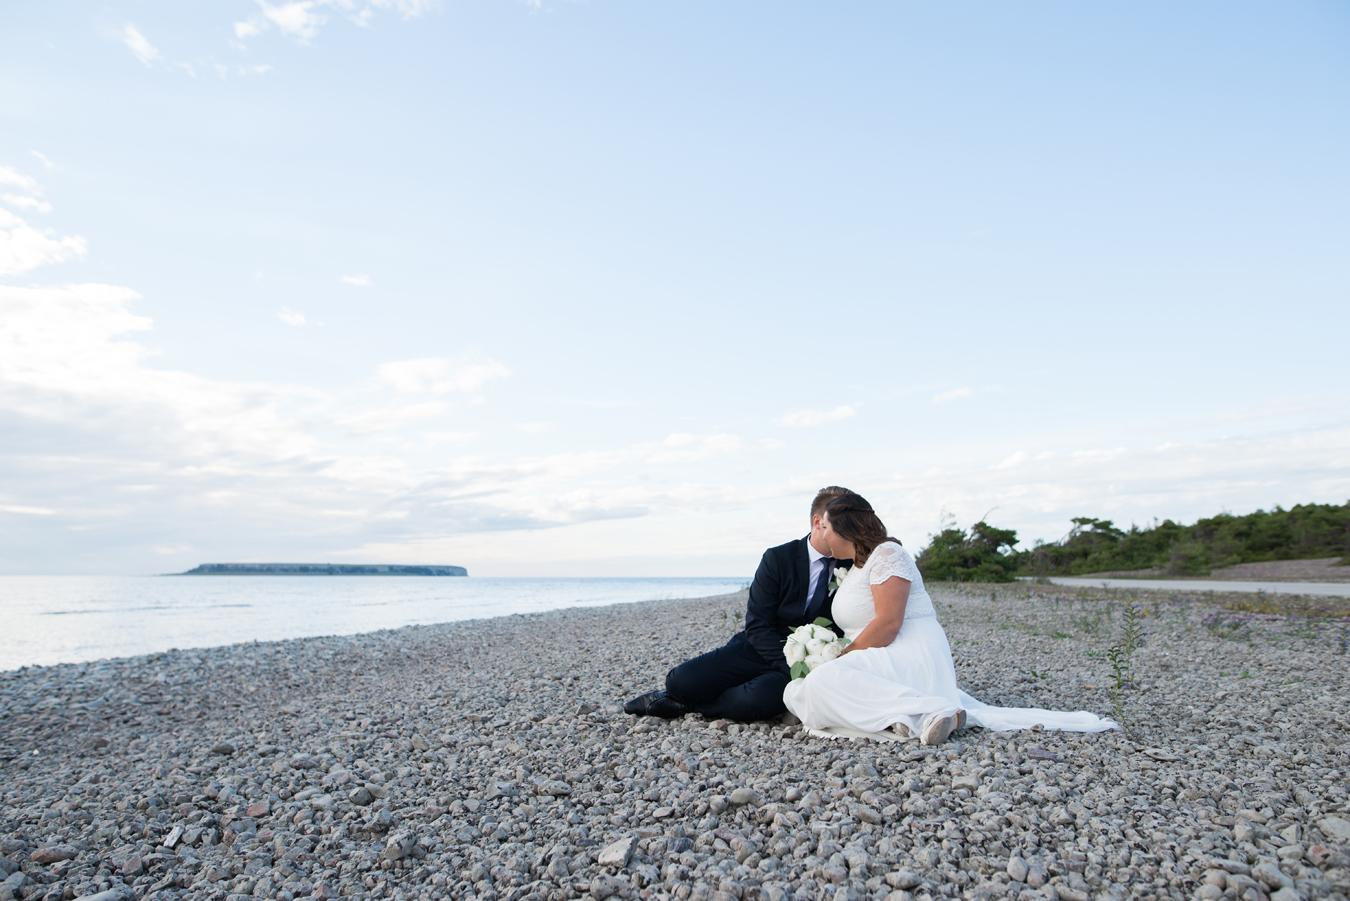 096-bröllopsfotograf-gotland-ekstakusten-neas-fotografi.jpg